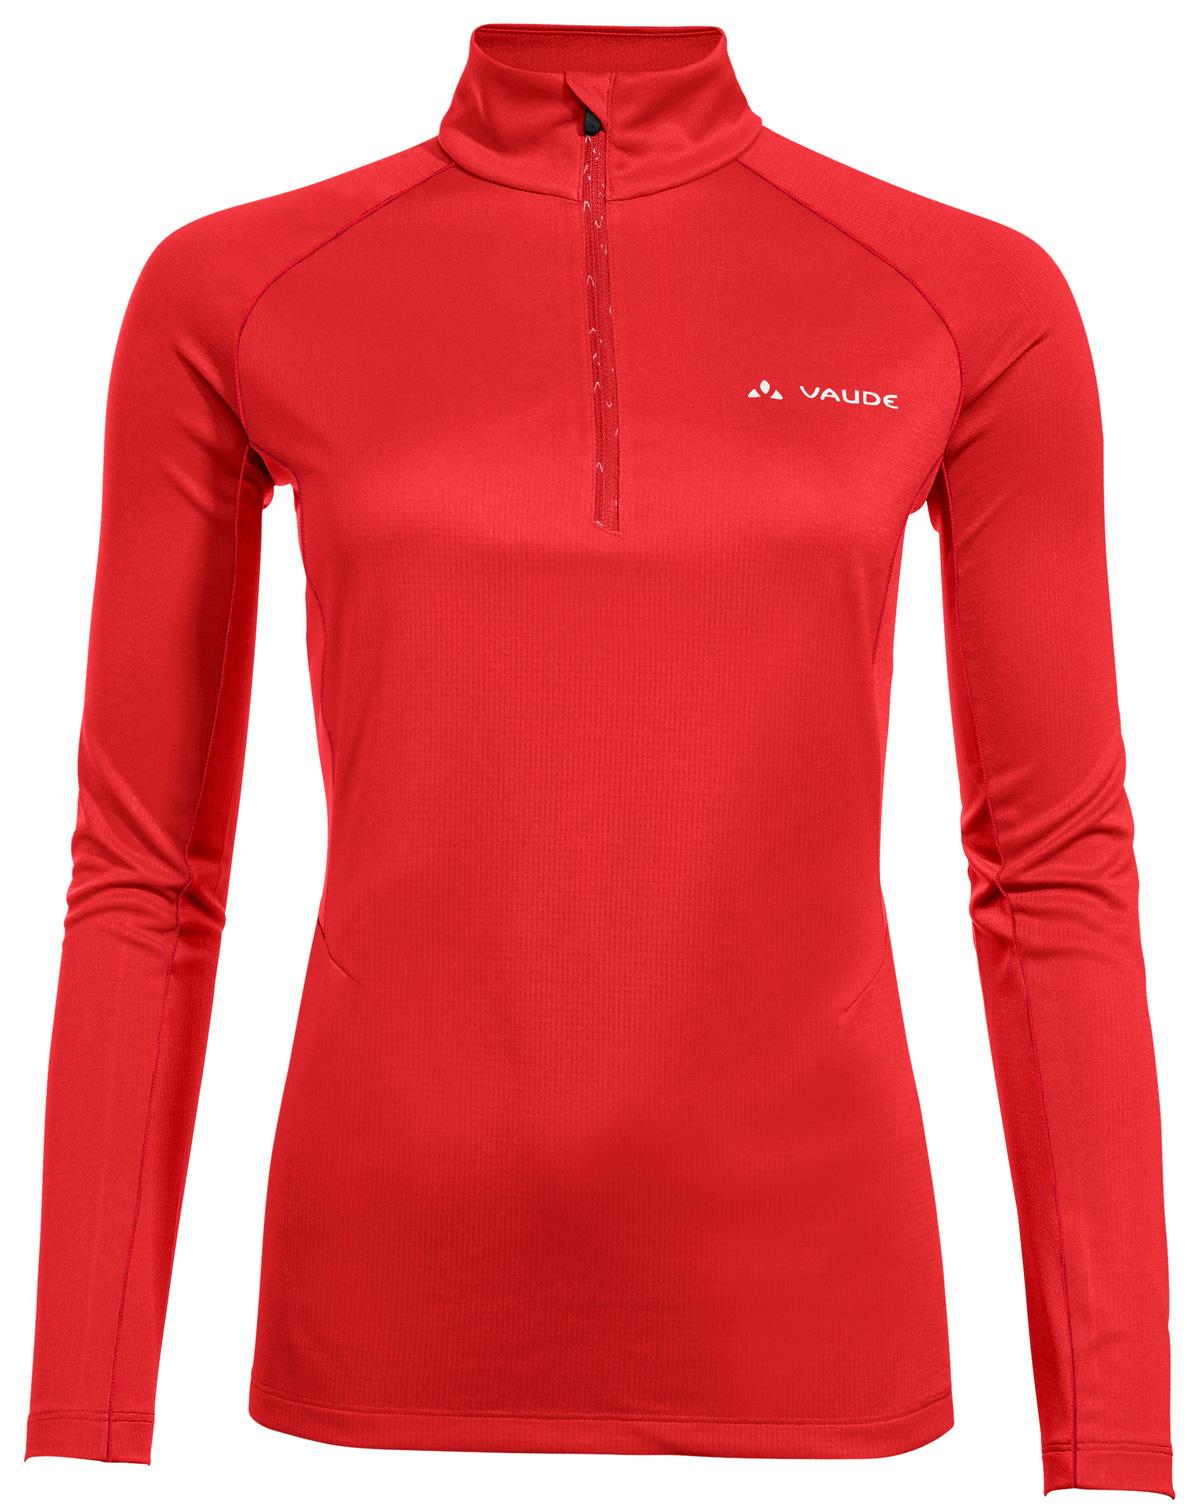 Vaude Larice Light Shirt II Damenpullover - mars red